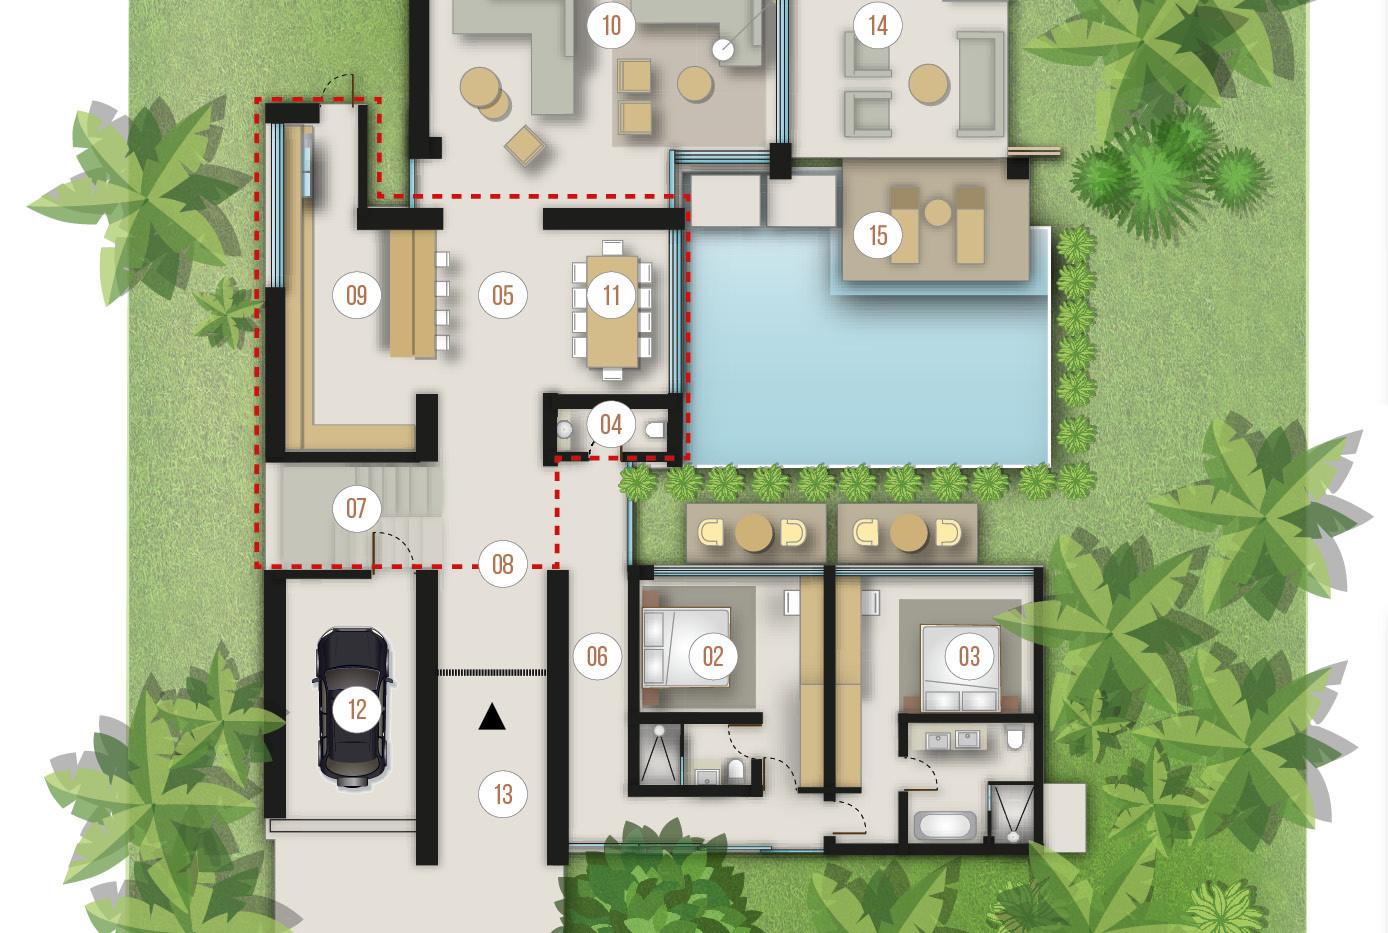 Villa 2b - 3 bedrooms